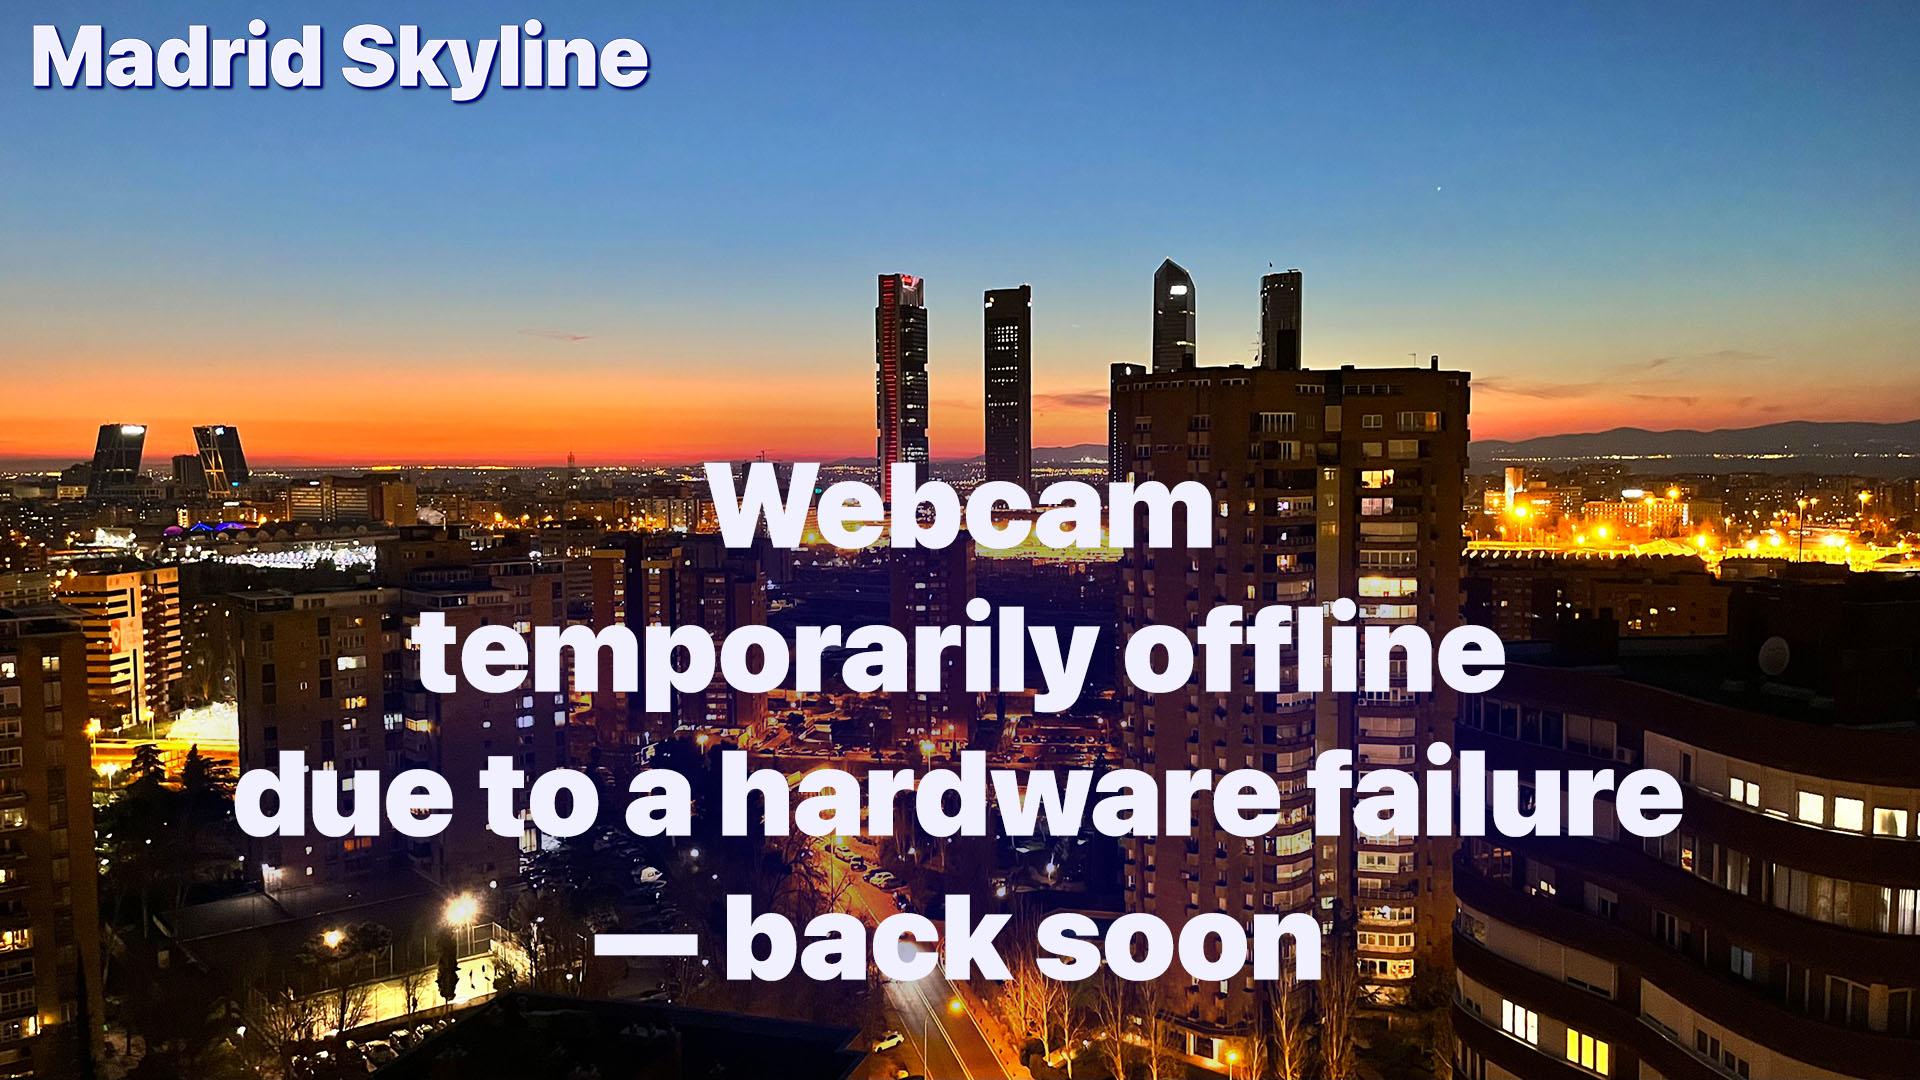 webcam live view Madrid